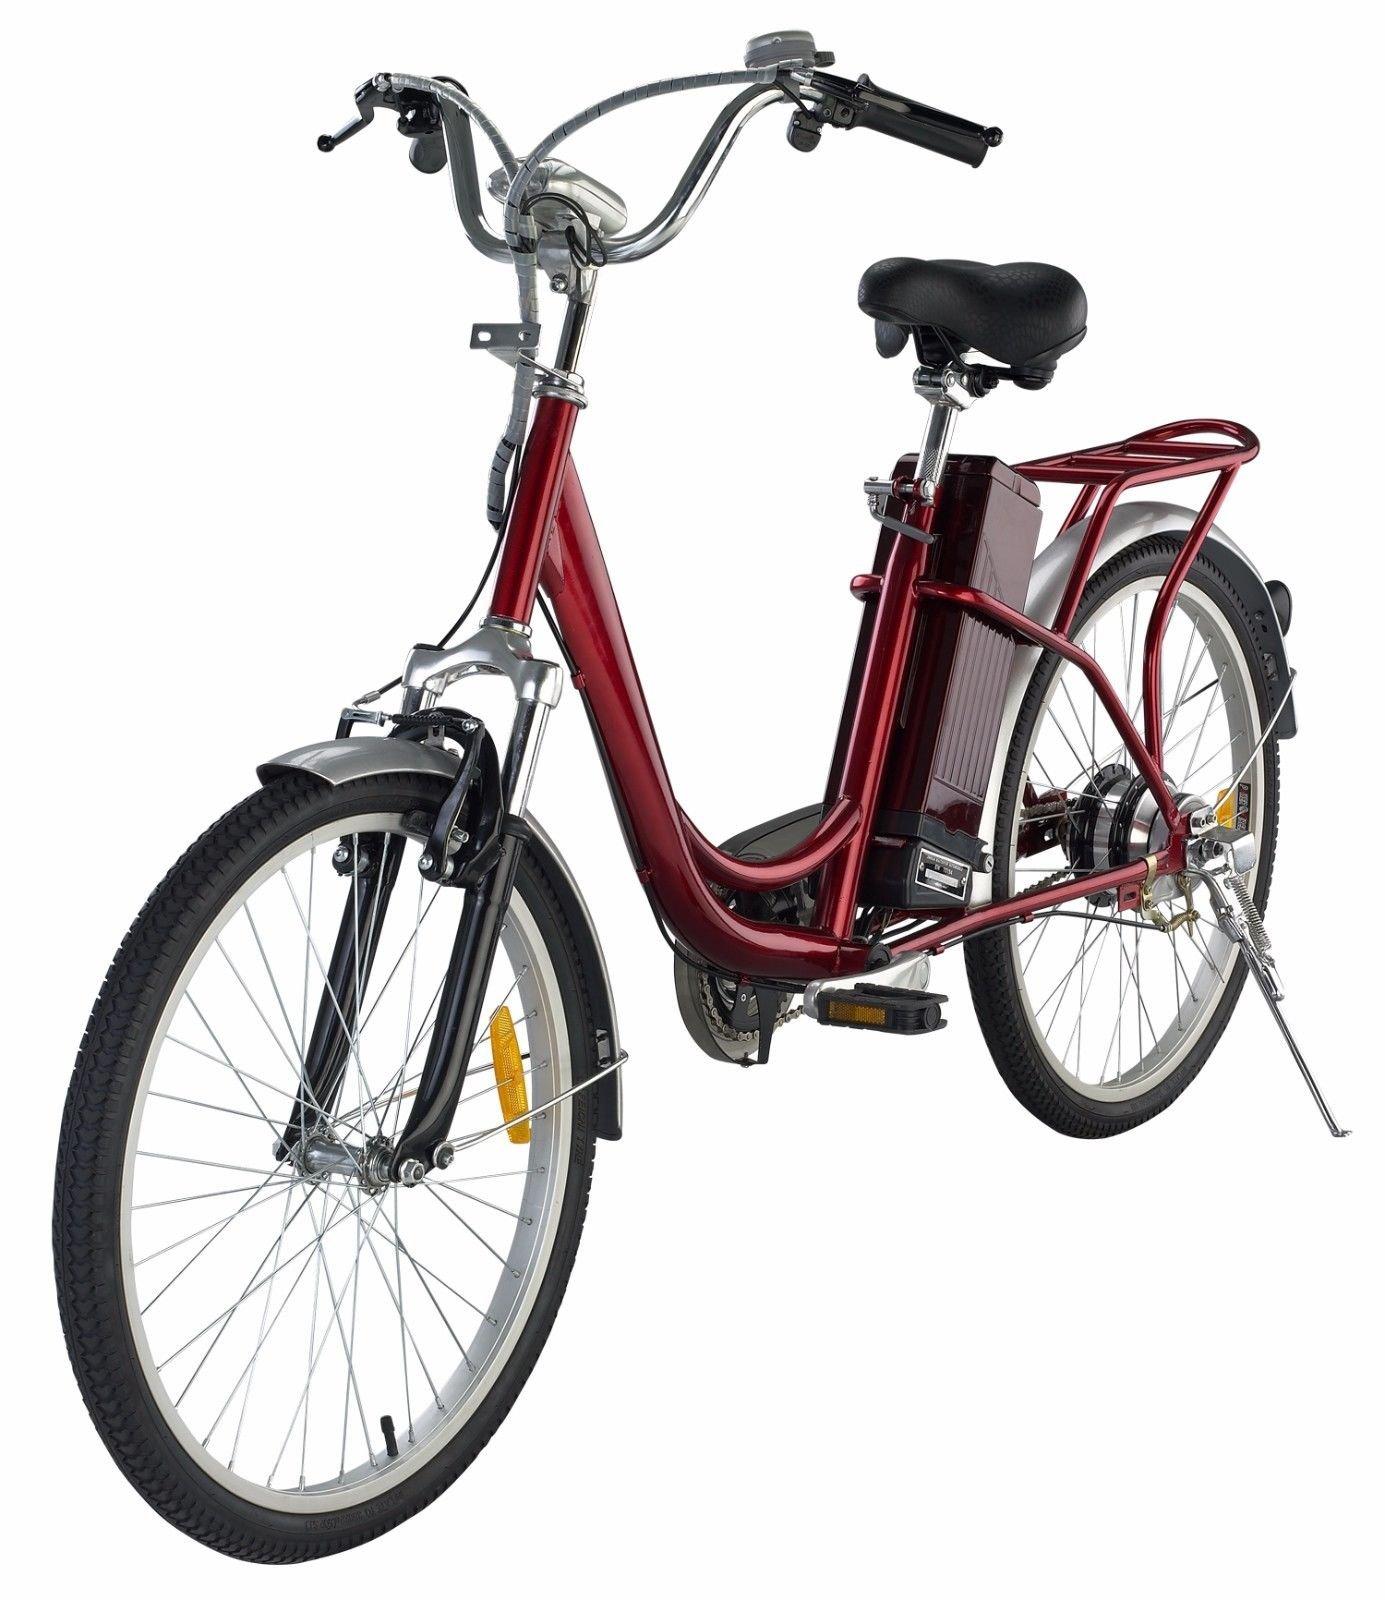 Classic Bicycle Electric Bike Red 250W 24V